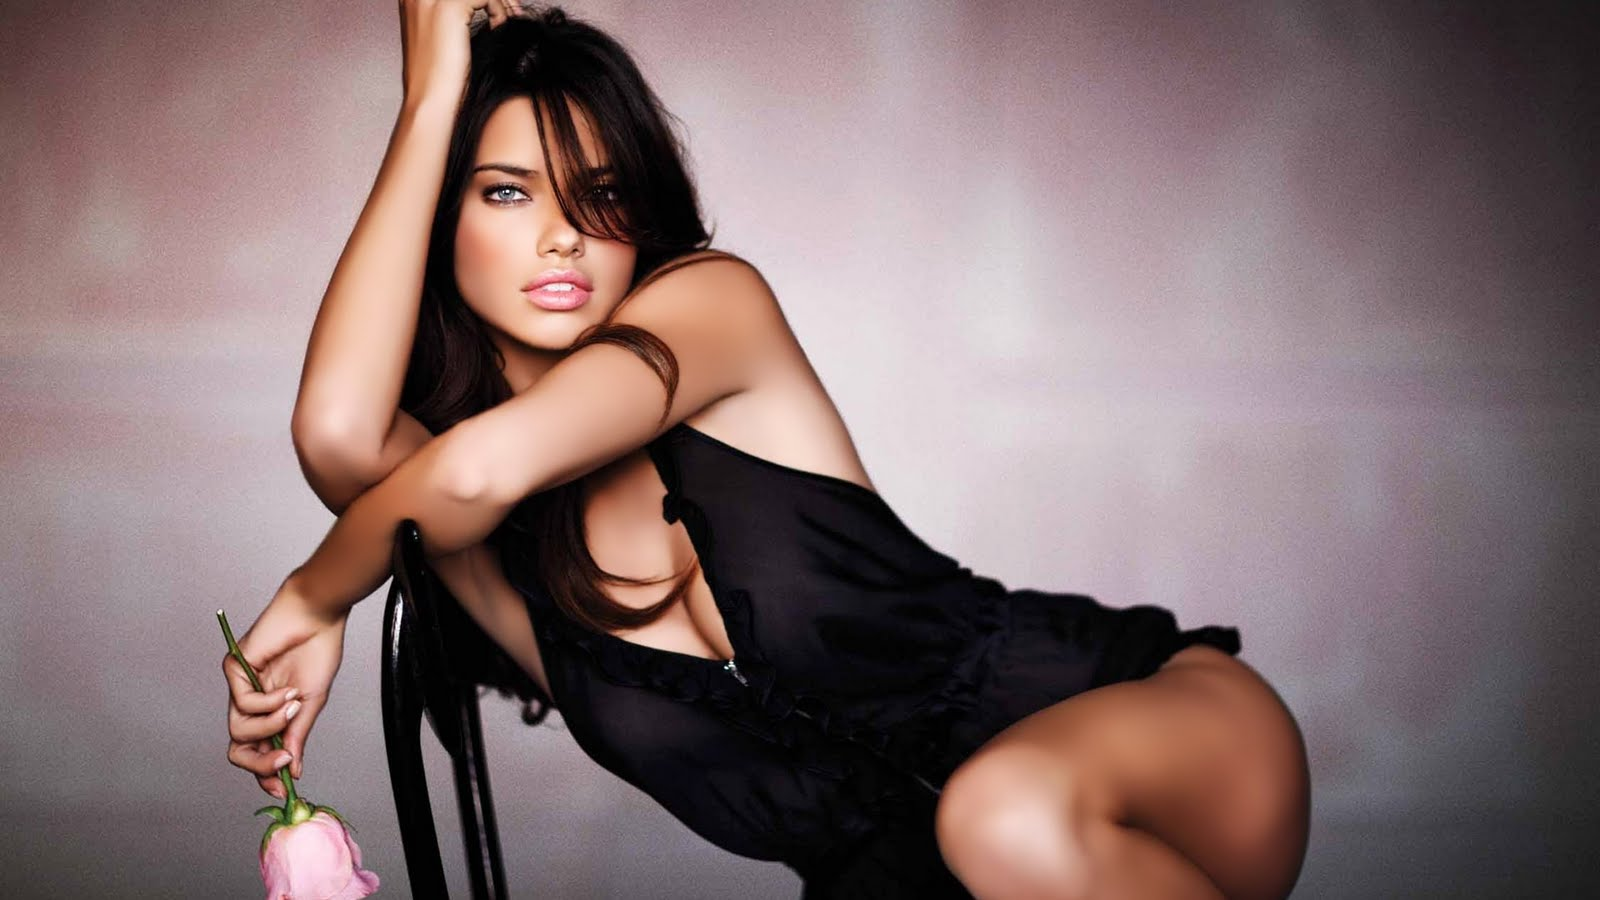 Mujeres Hermosas Wallpapers HD